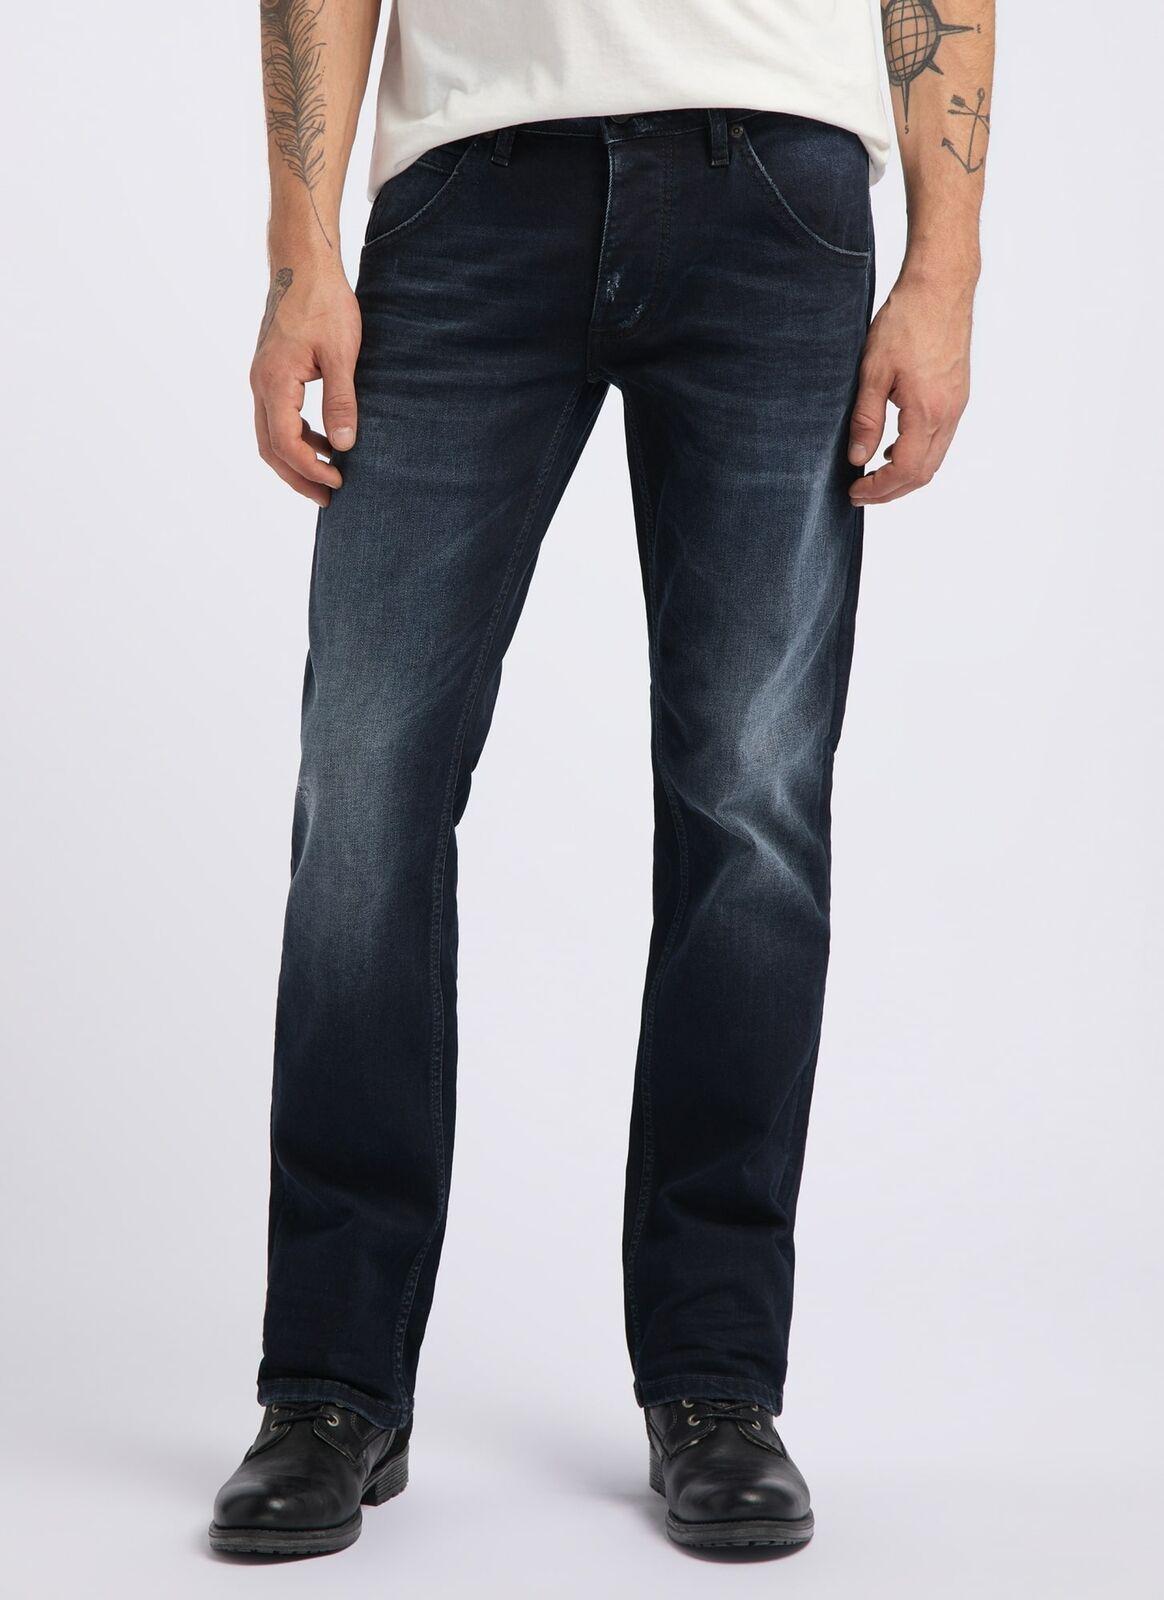 Mustang Michigan Straight Herren Jeans / dark used / Regular Fit